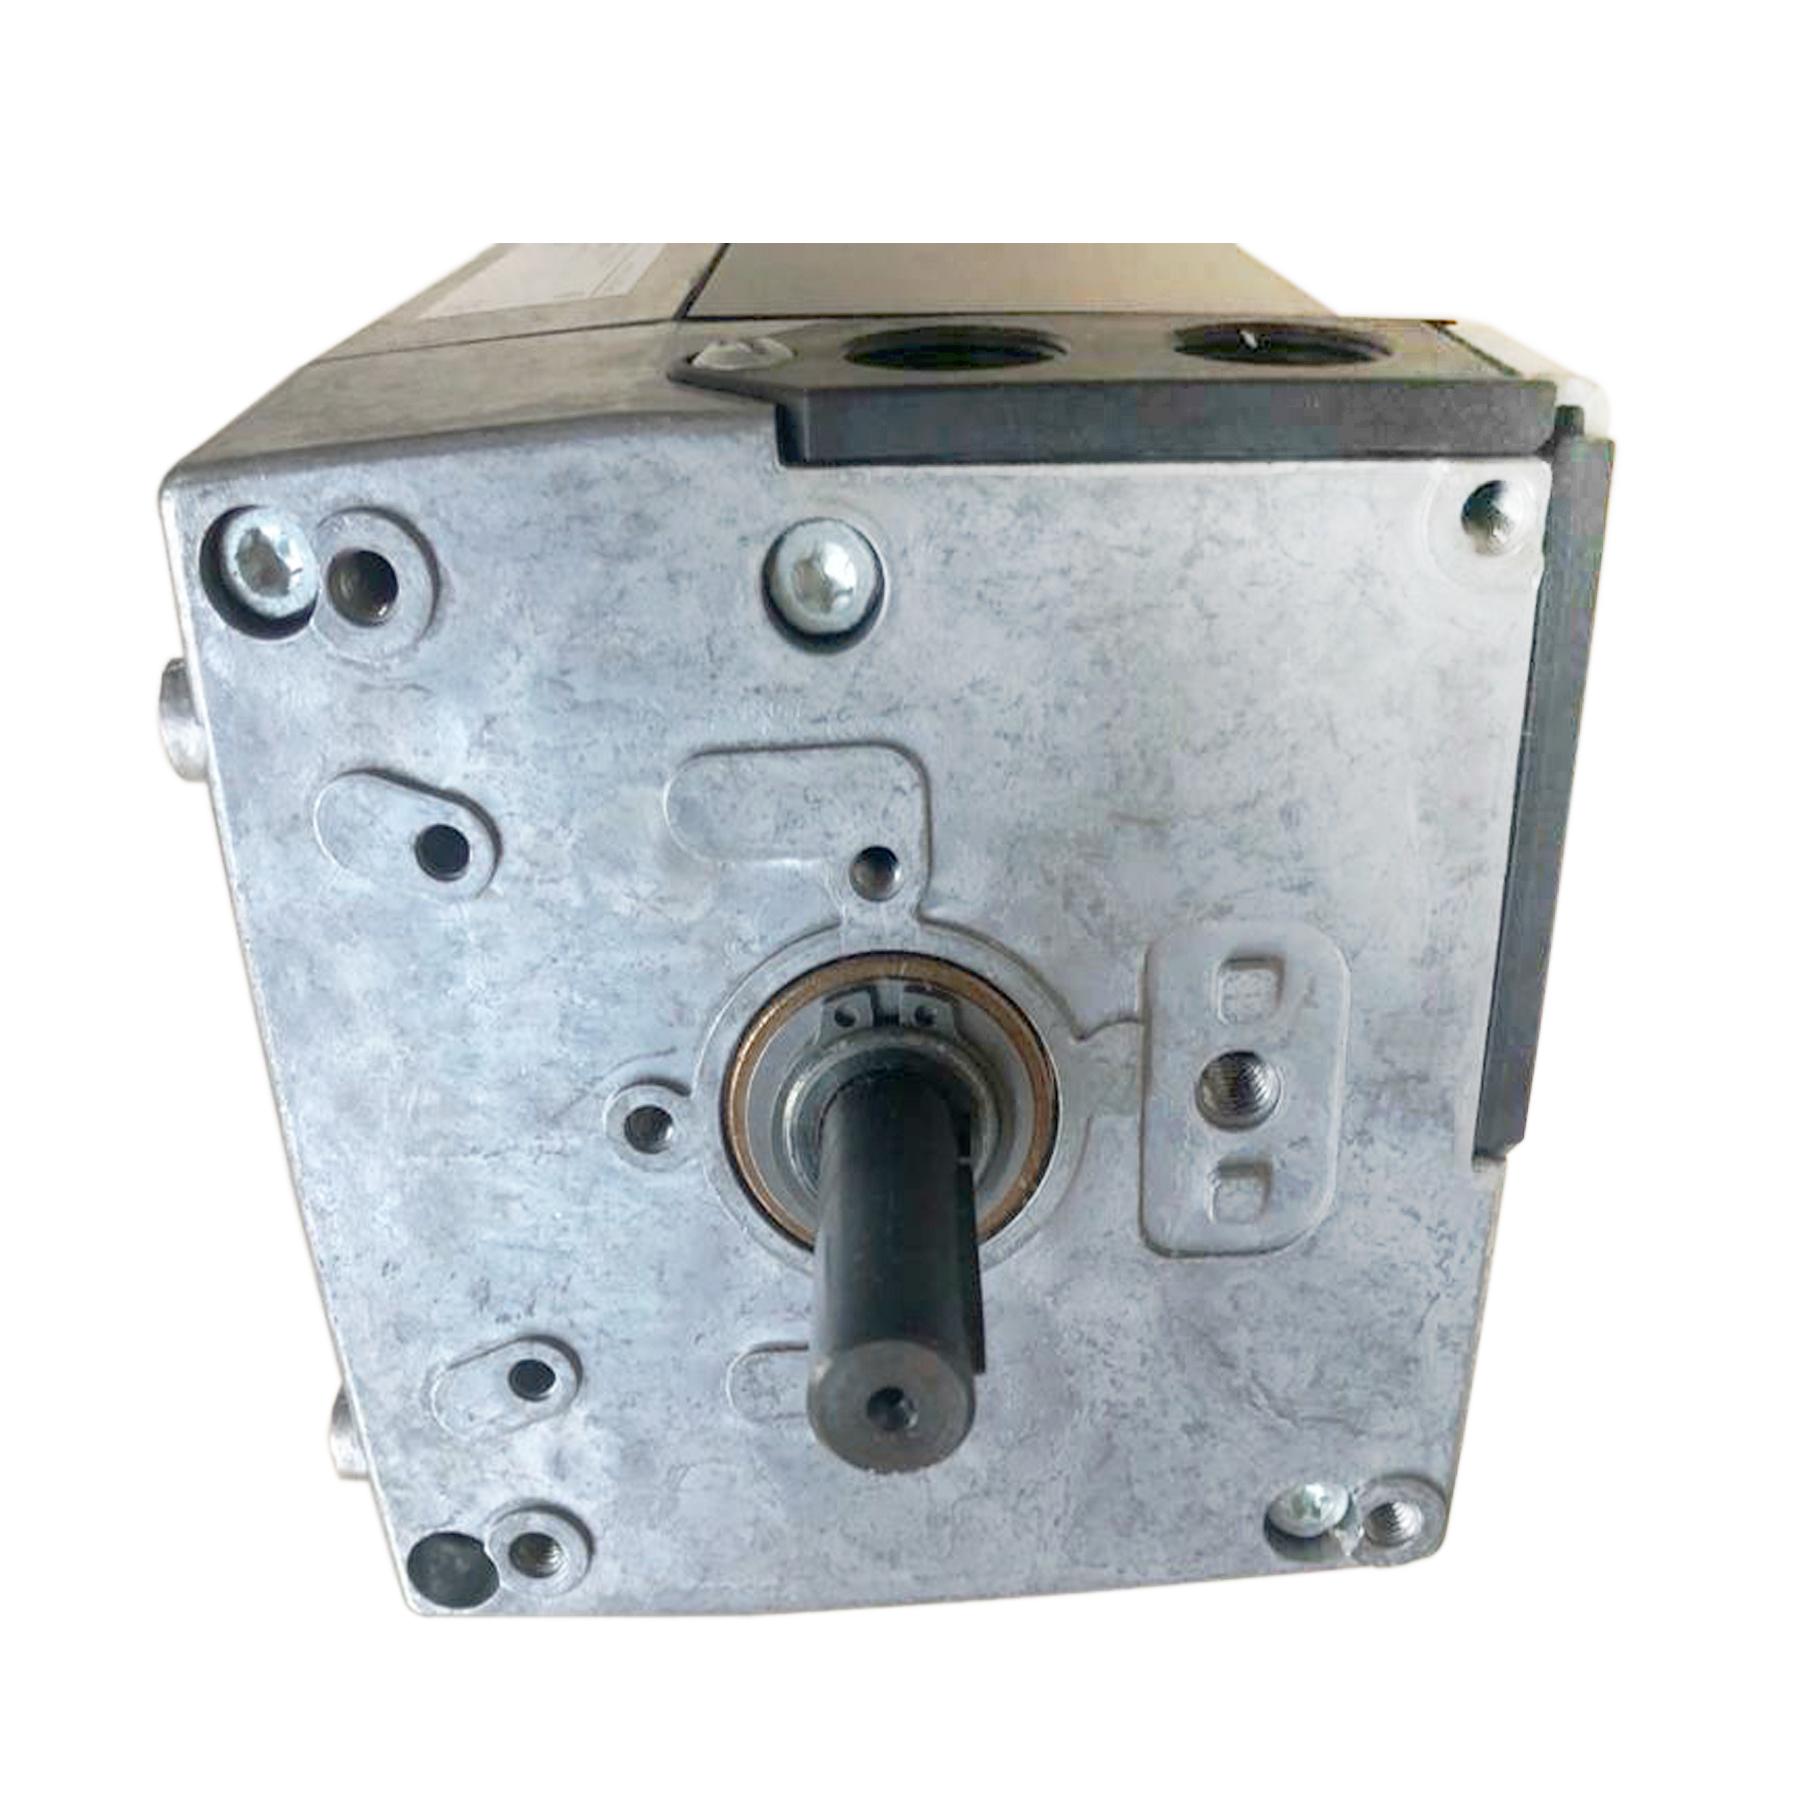 Siemens servo motor SQM56.687A2